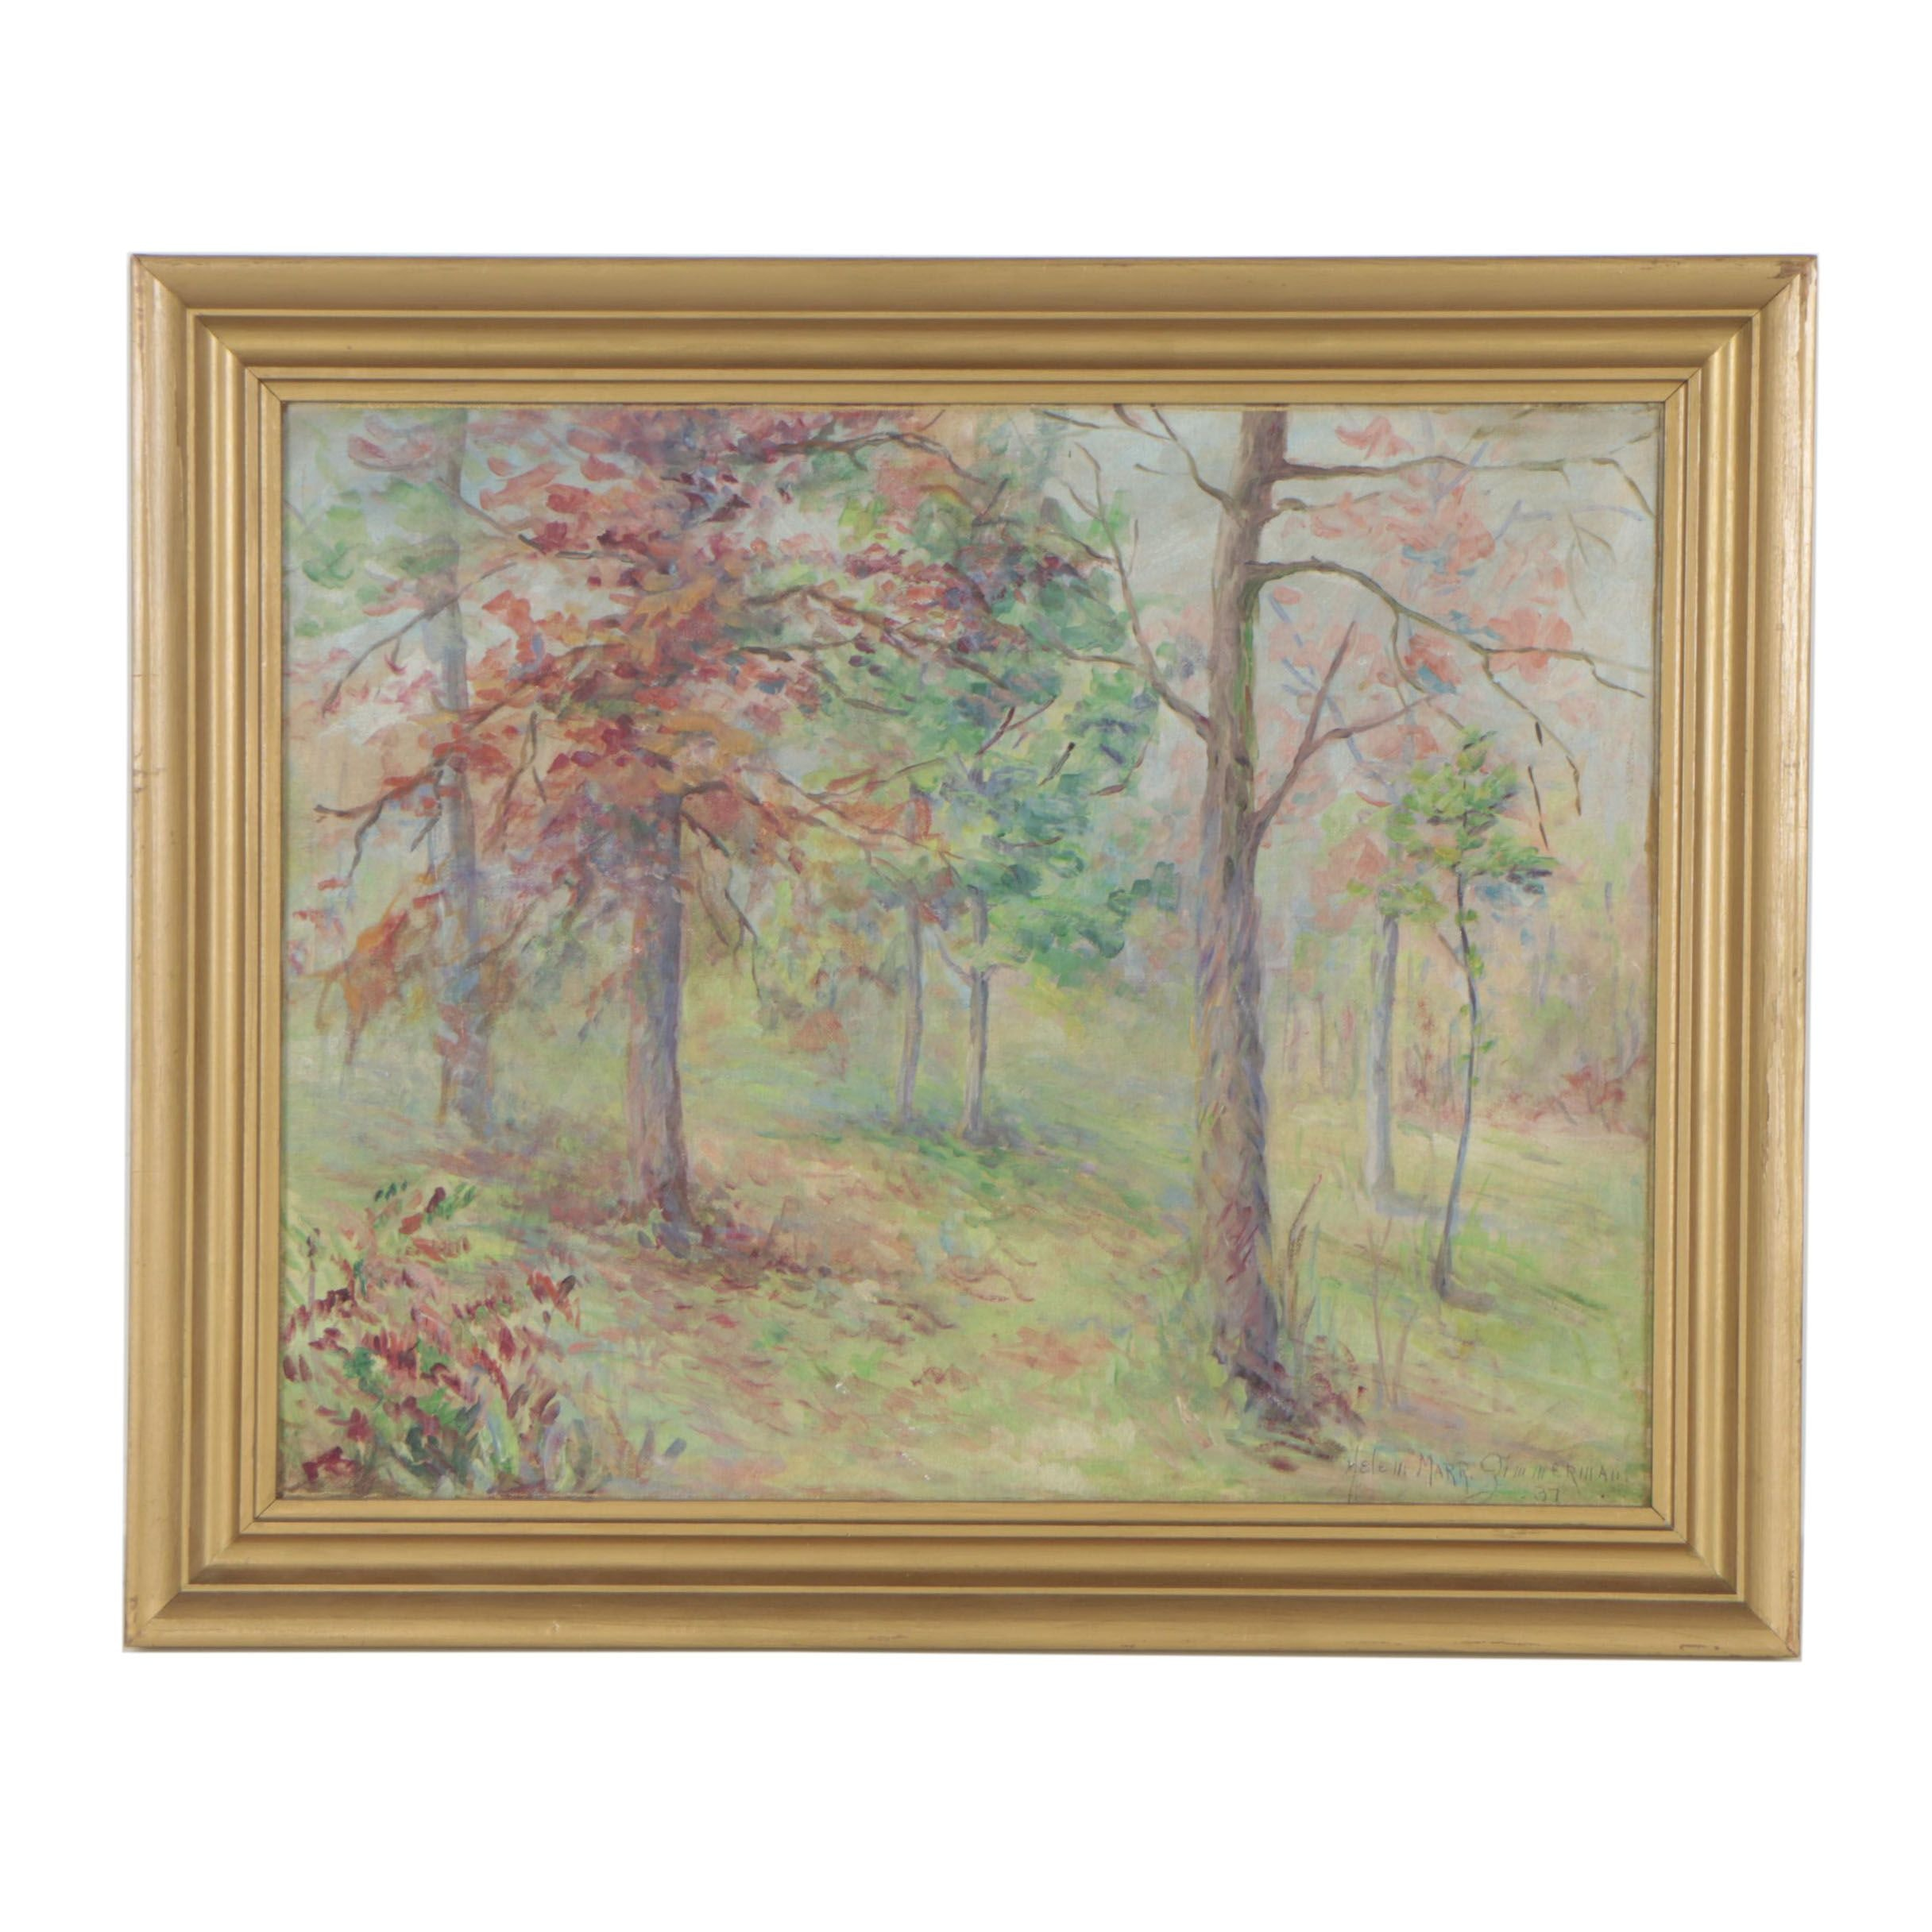 Helen Marr Zimmerman 1937 Oil Painting